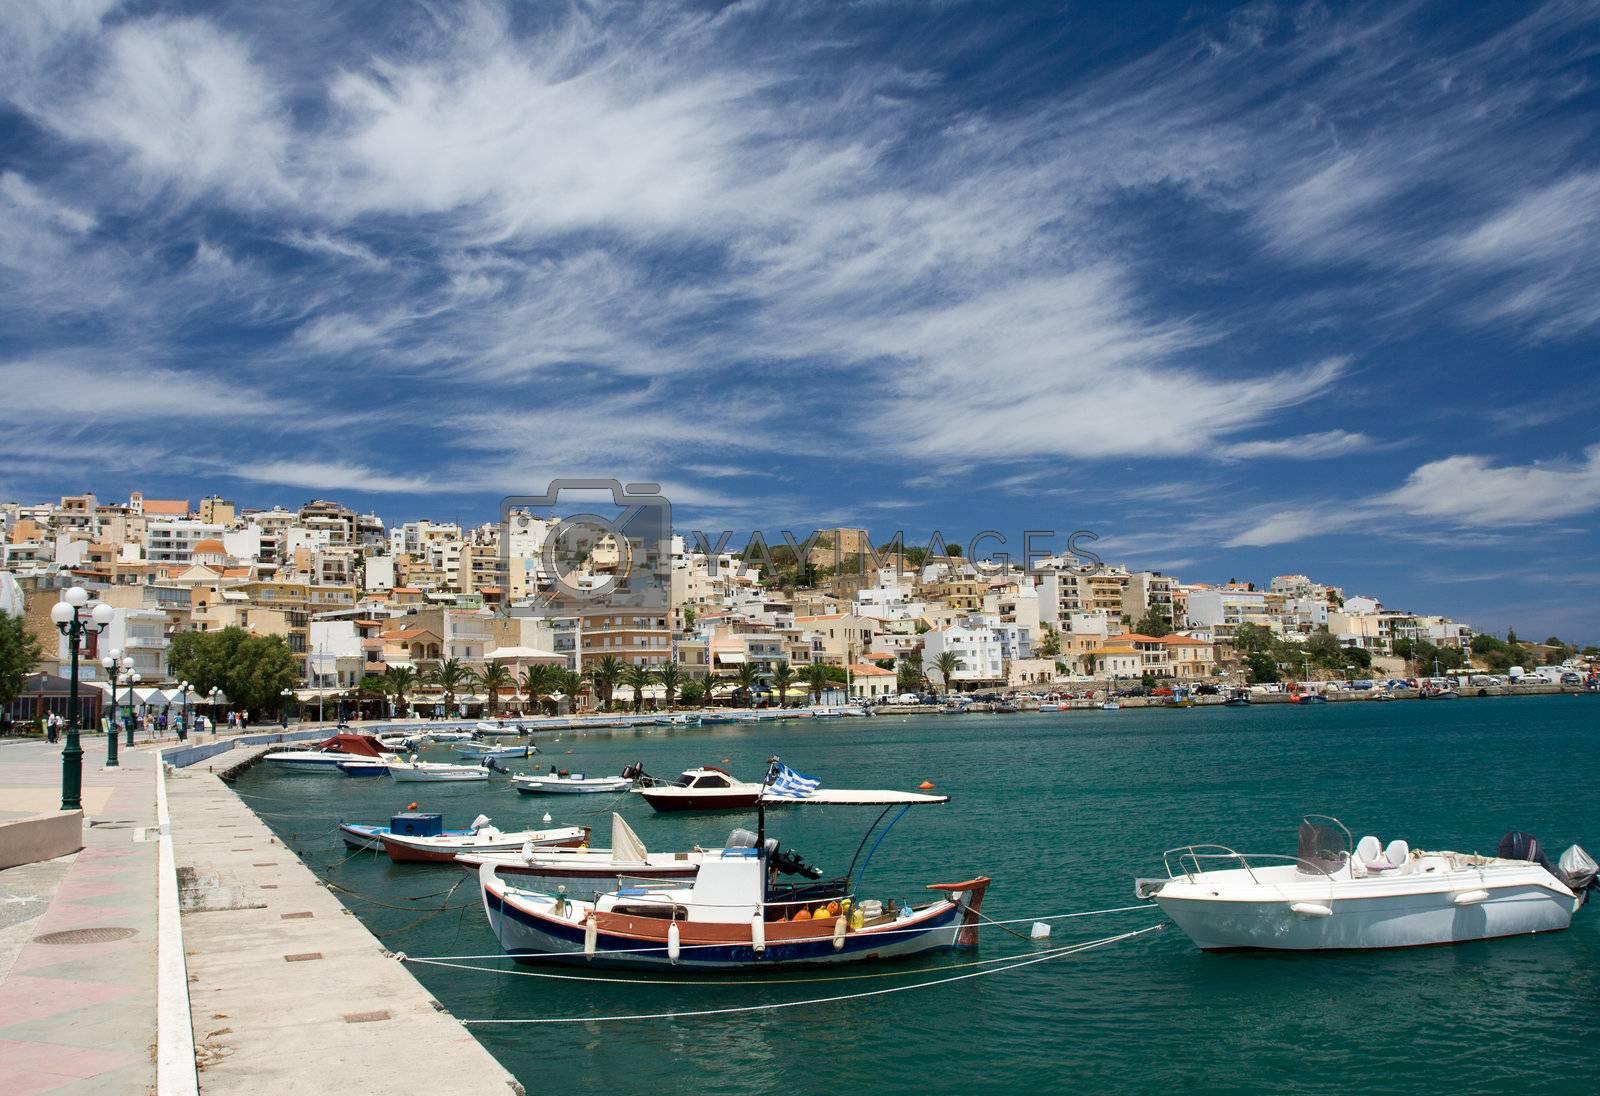 Sea bay, promenade in Mediterranean town and cirrus clouds by SergeyAK